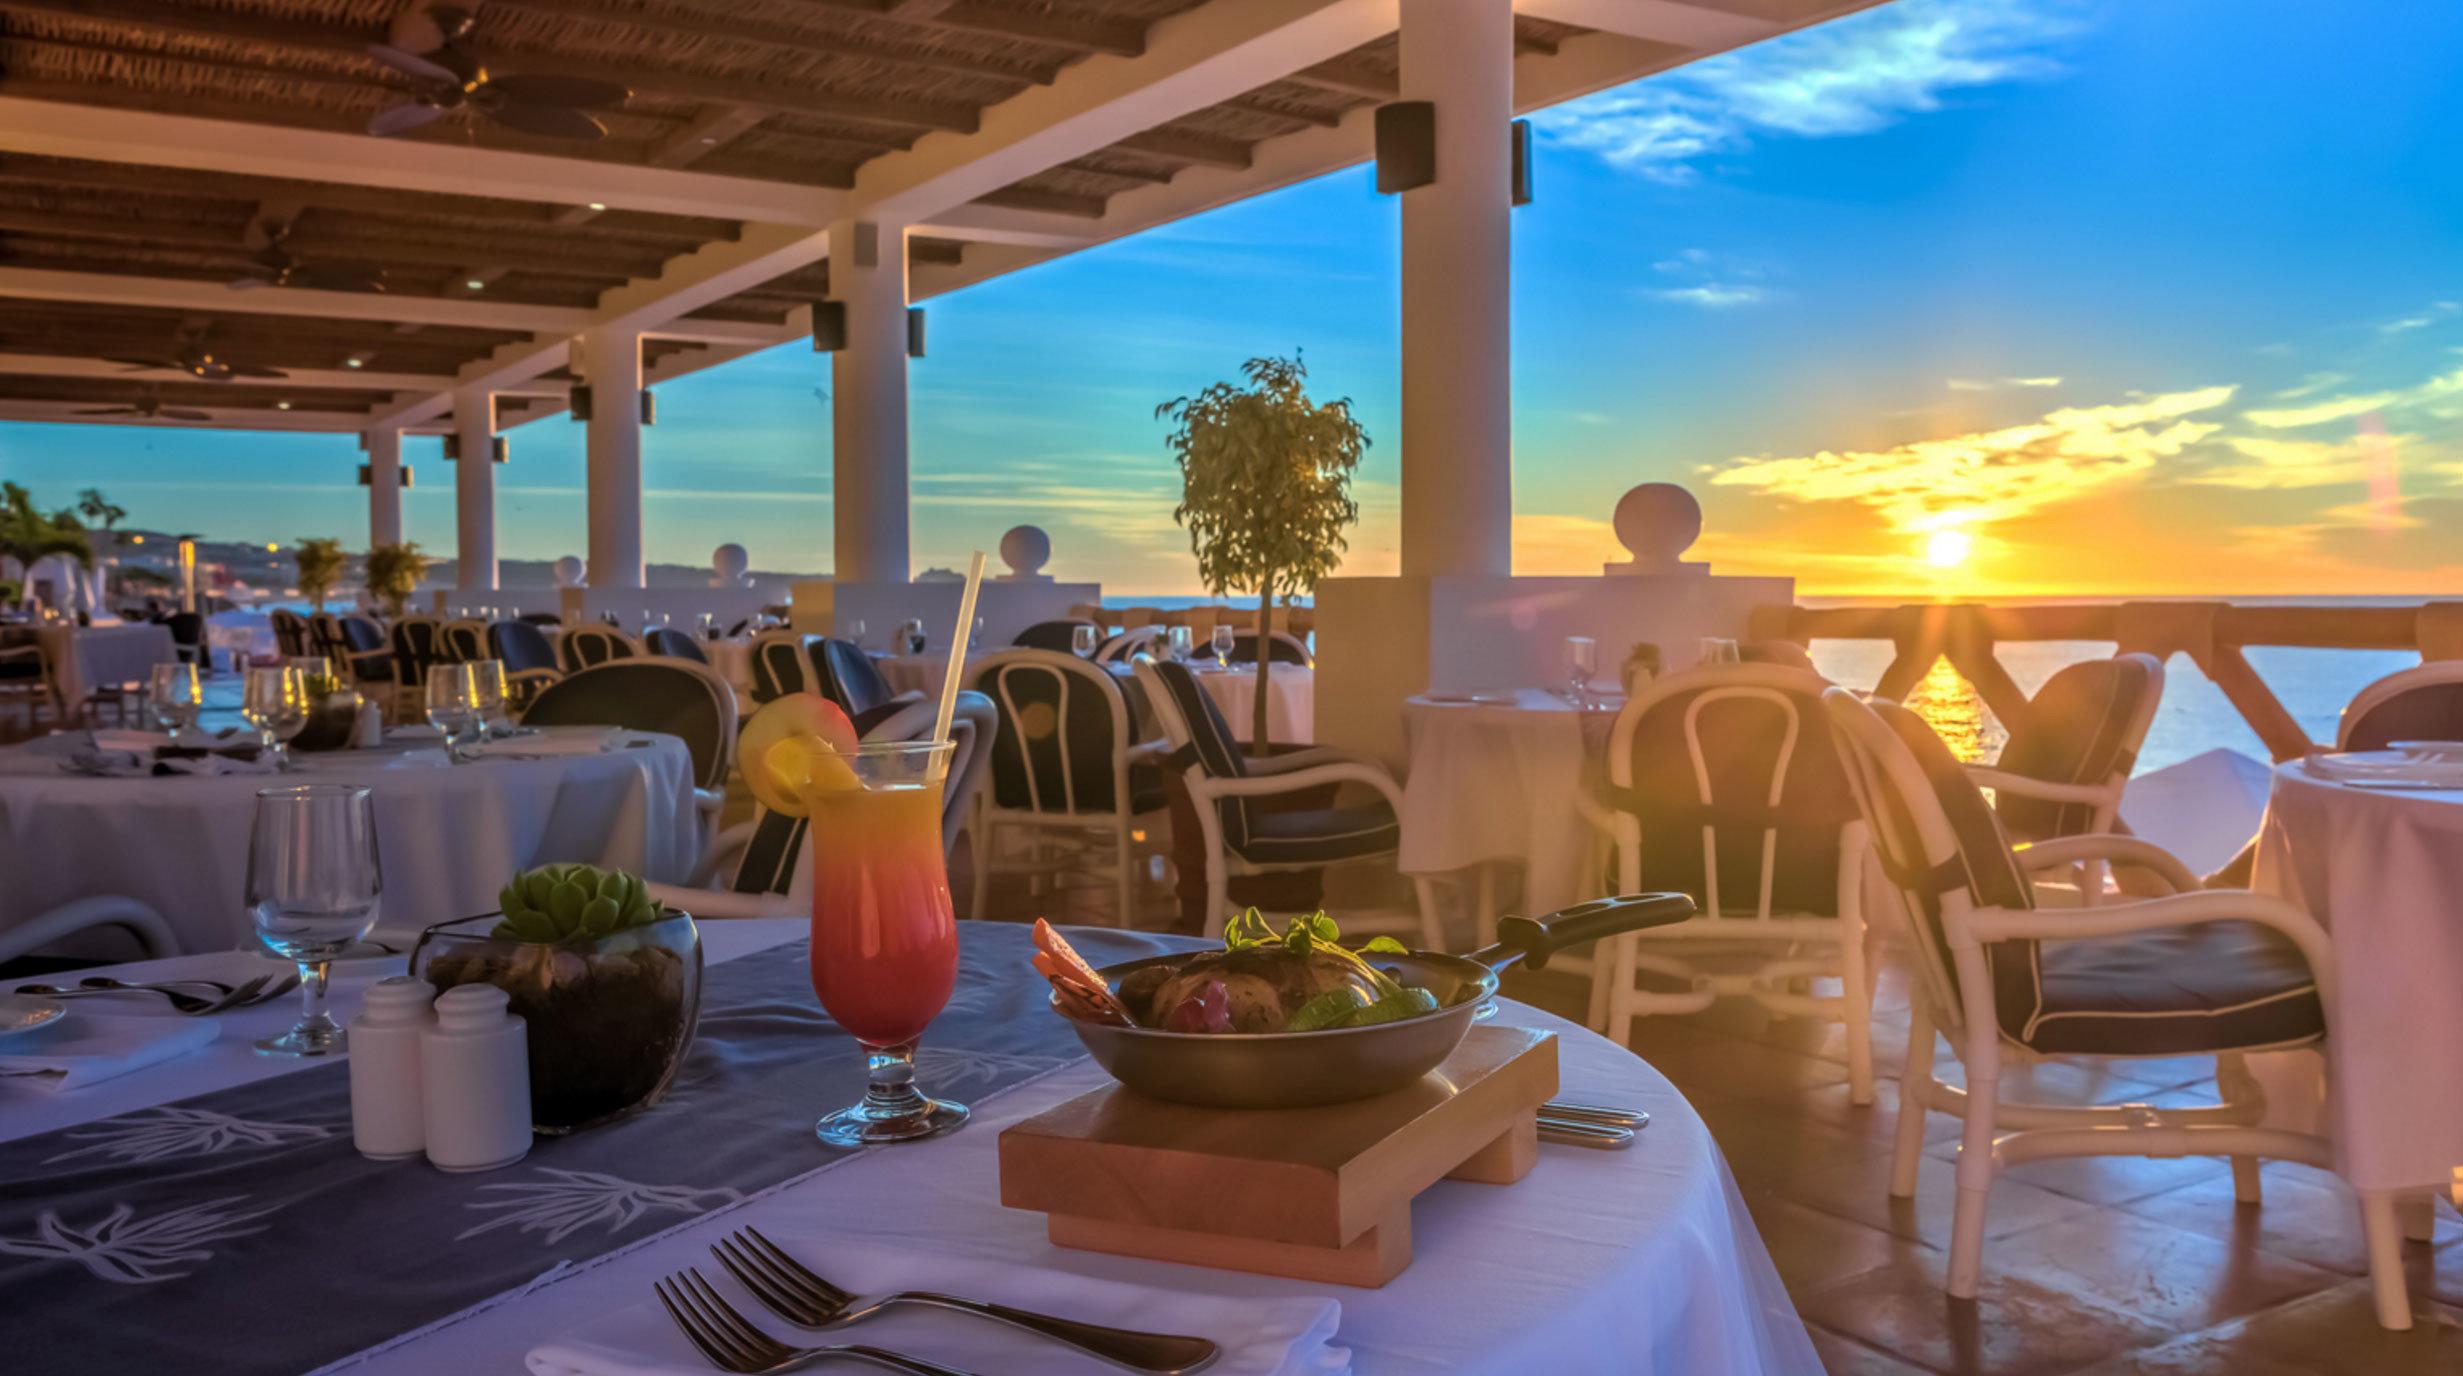 chair Resort restaurant Dining caribbean set